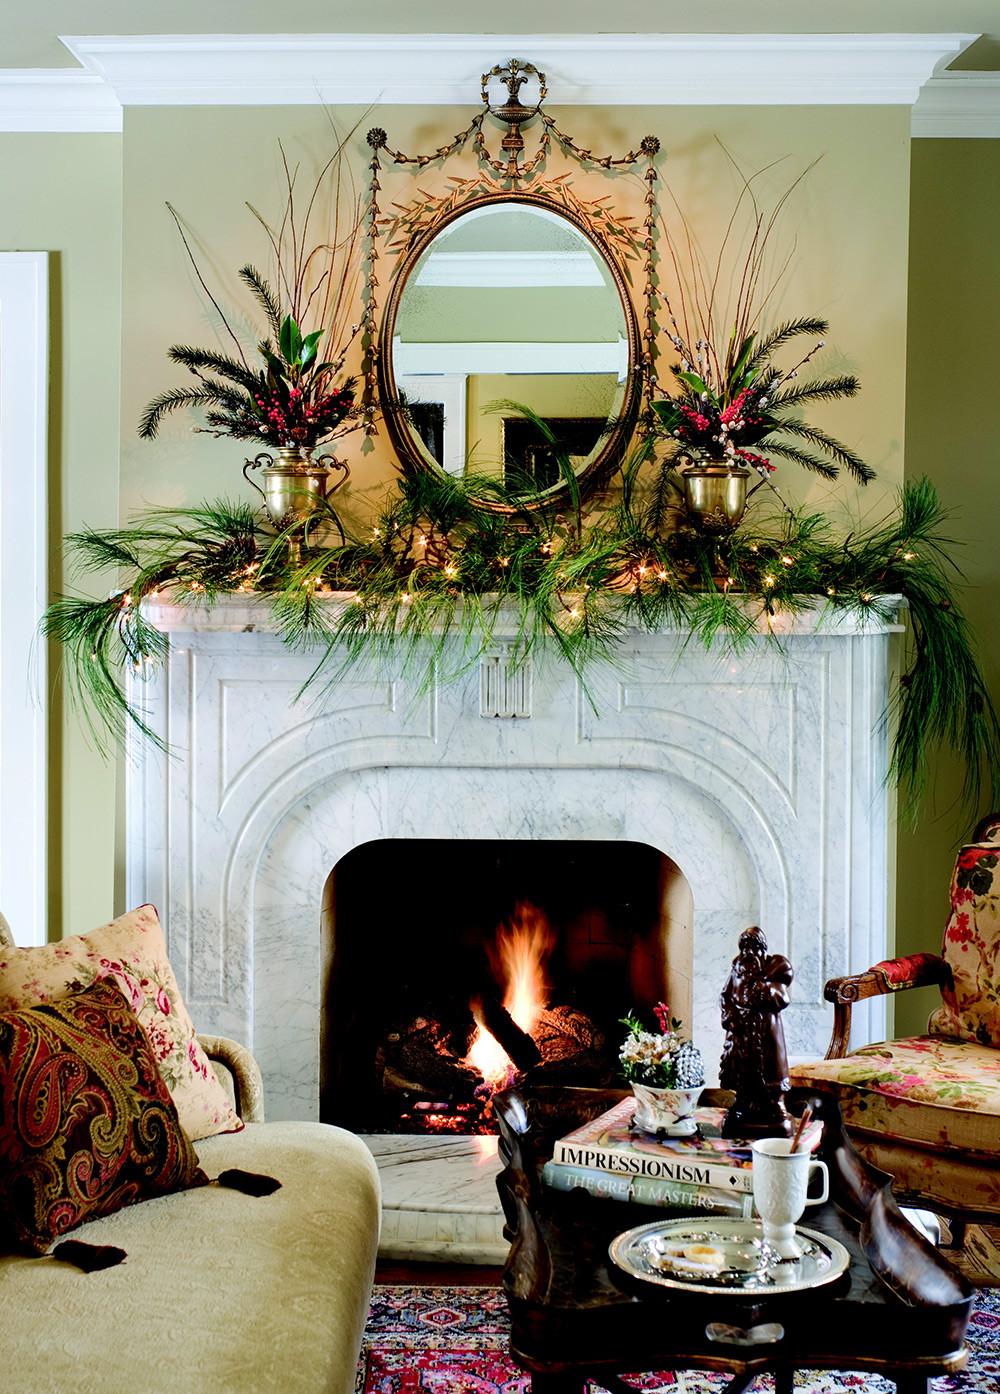 Christmas Fireplace Decor Pinterest  Create a Mantel Masterpiece this Holiday Season Nell Hills